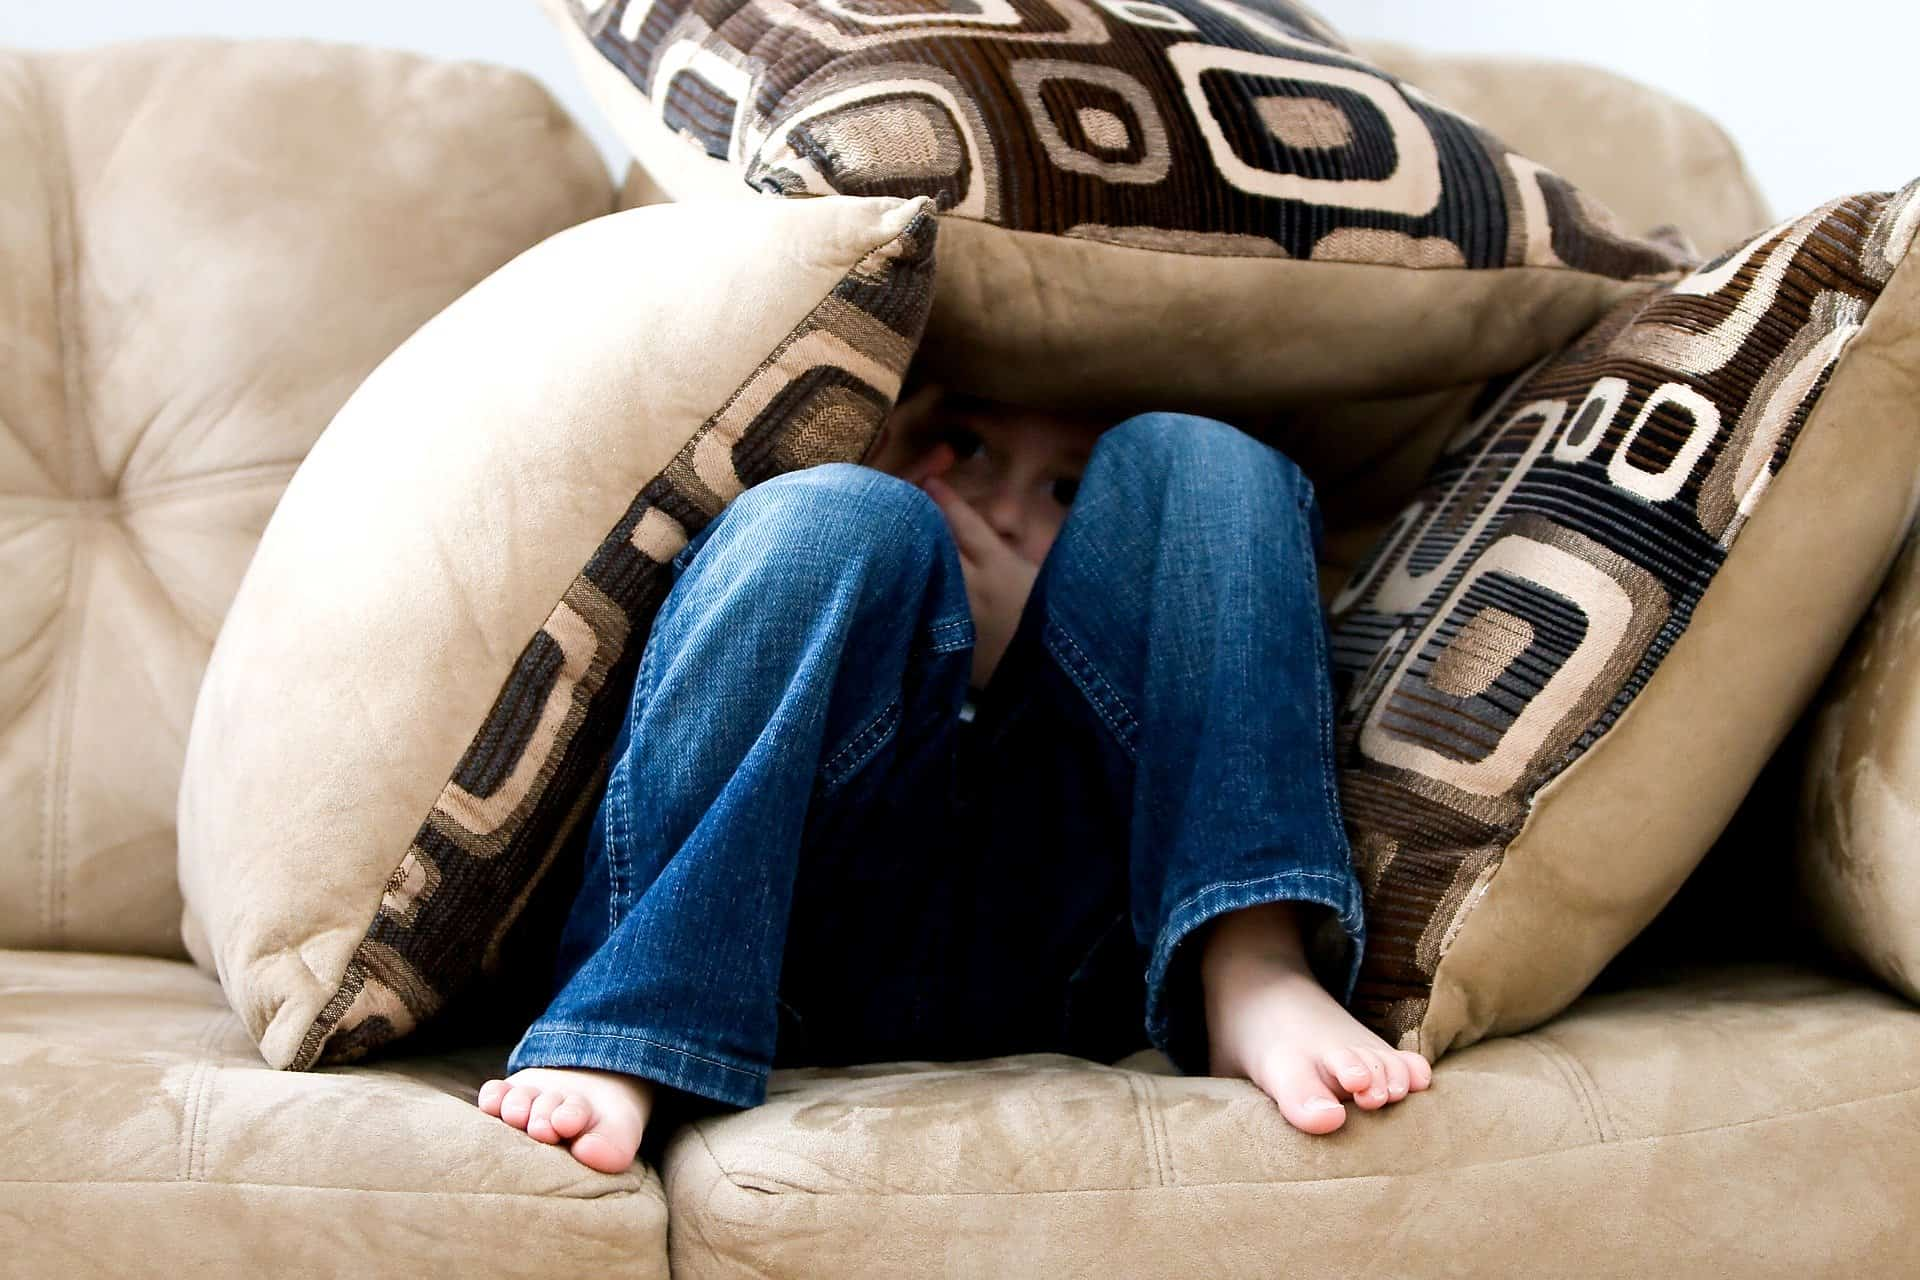 A little boy hiding underneath cushions